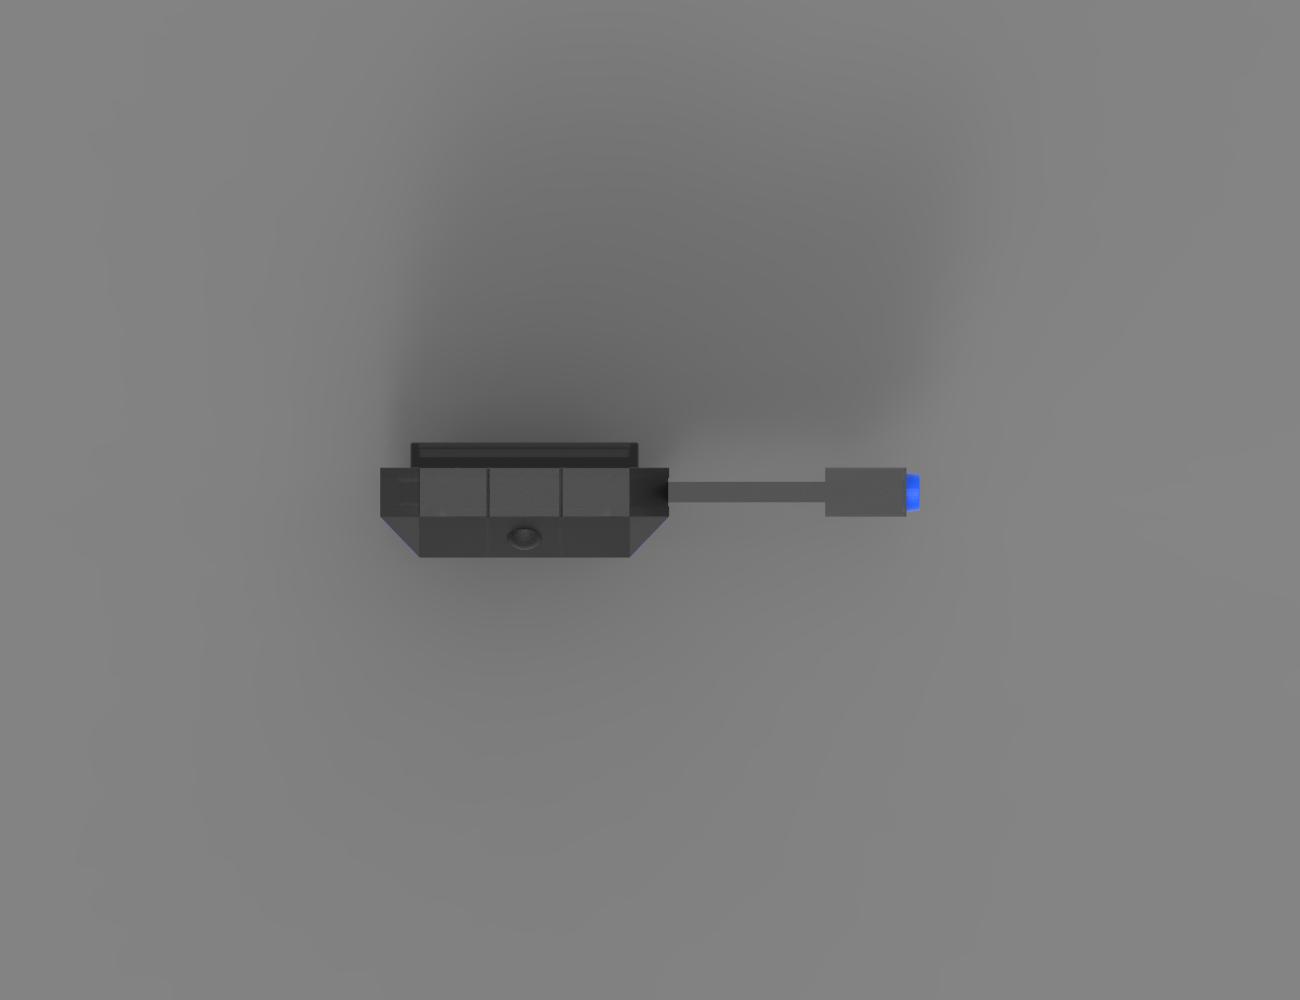 render_scene.14.png Download STL file Pokemon Xtransceiver 3D print model • 3D print model, 3D-mon